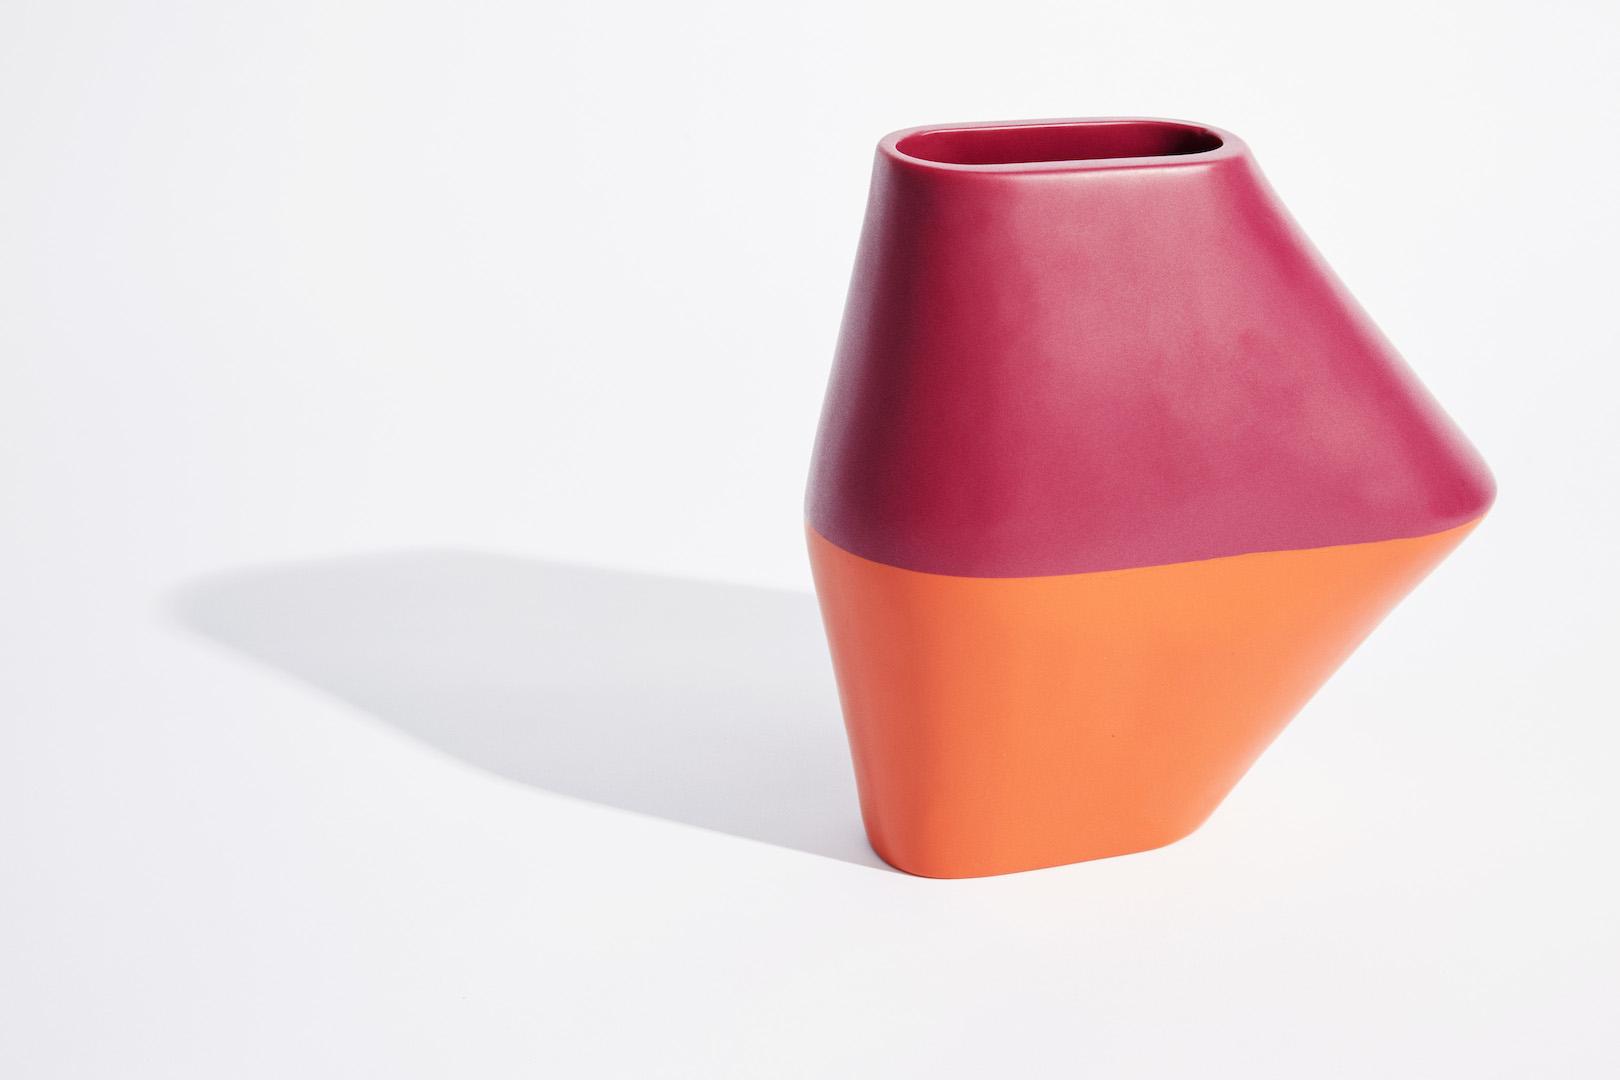 Dinosaur Designs_Colour Block_Homewares_Single Red:Orange Vase.jpg